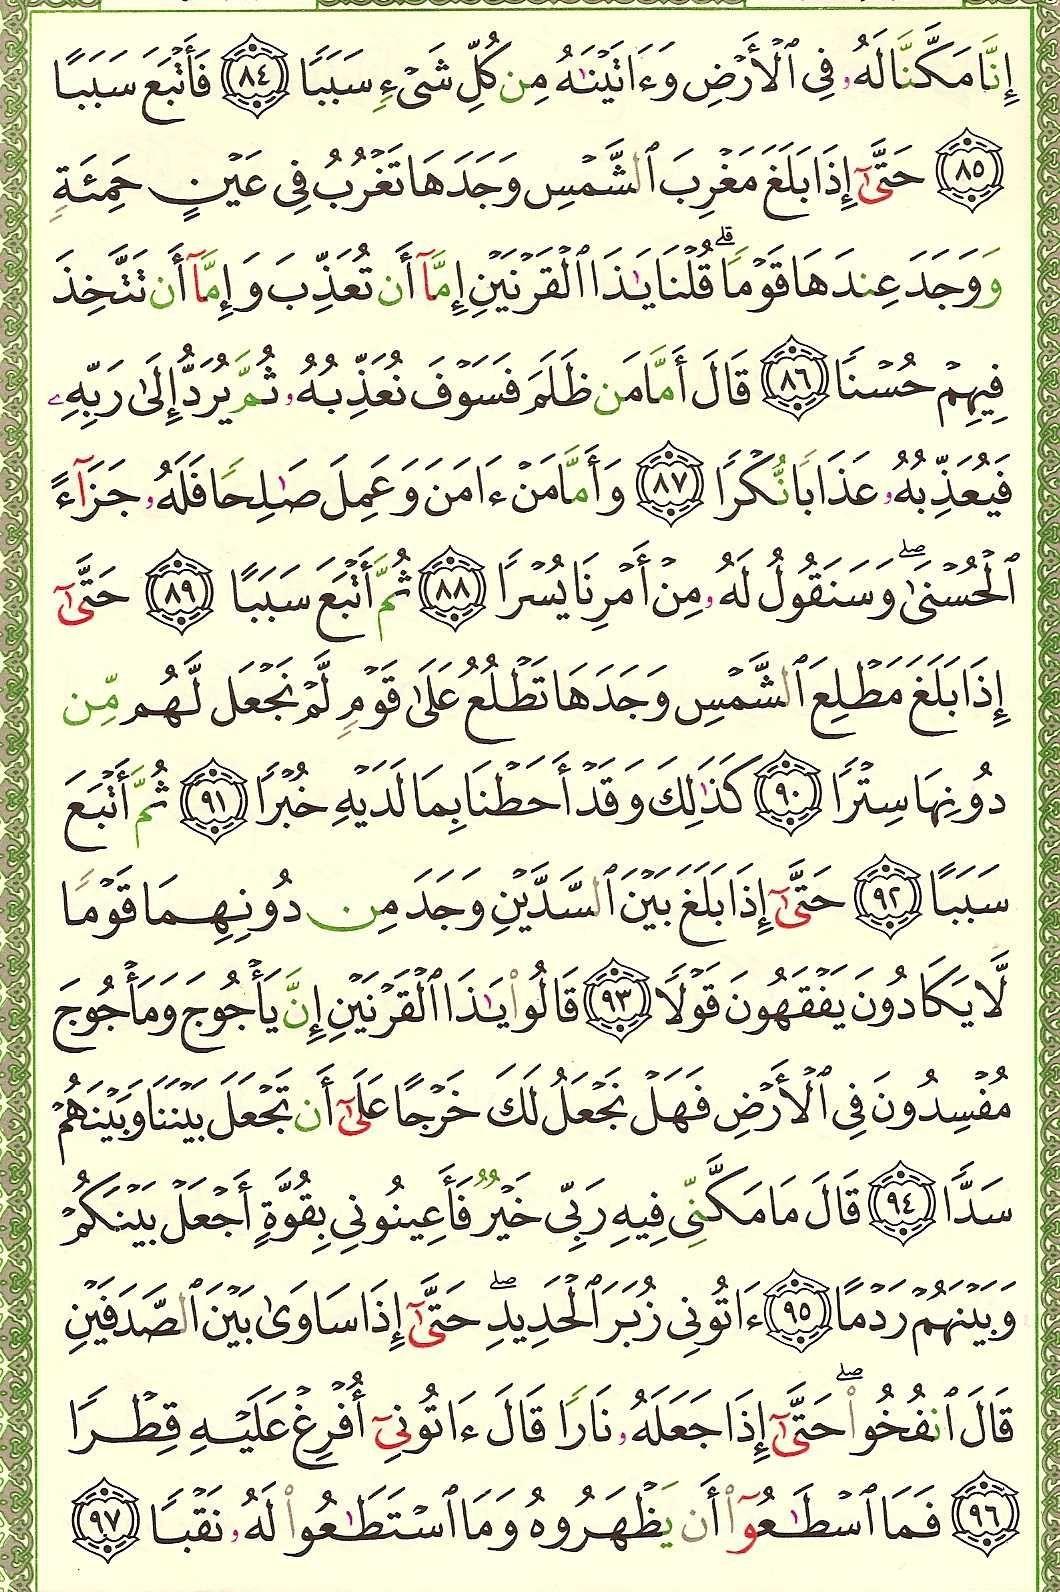 Quran 18 Al Kahf سورة الكهف Style 1 Page 303 القرآن الكريم Quran Math Sheet Music